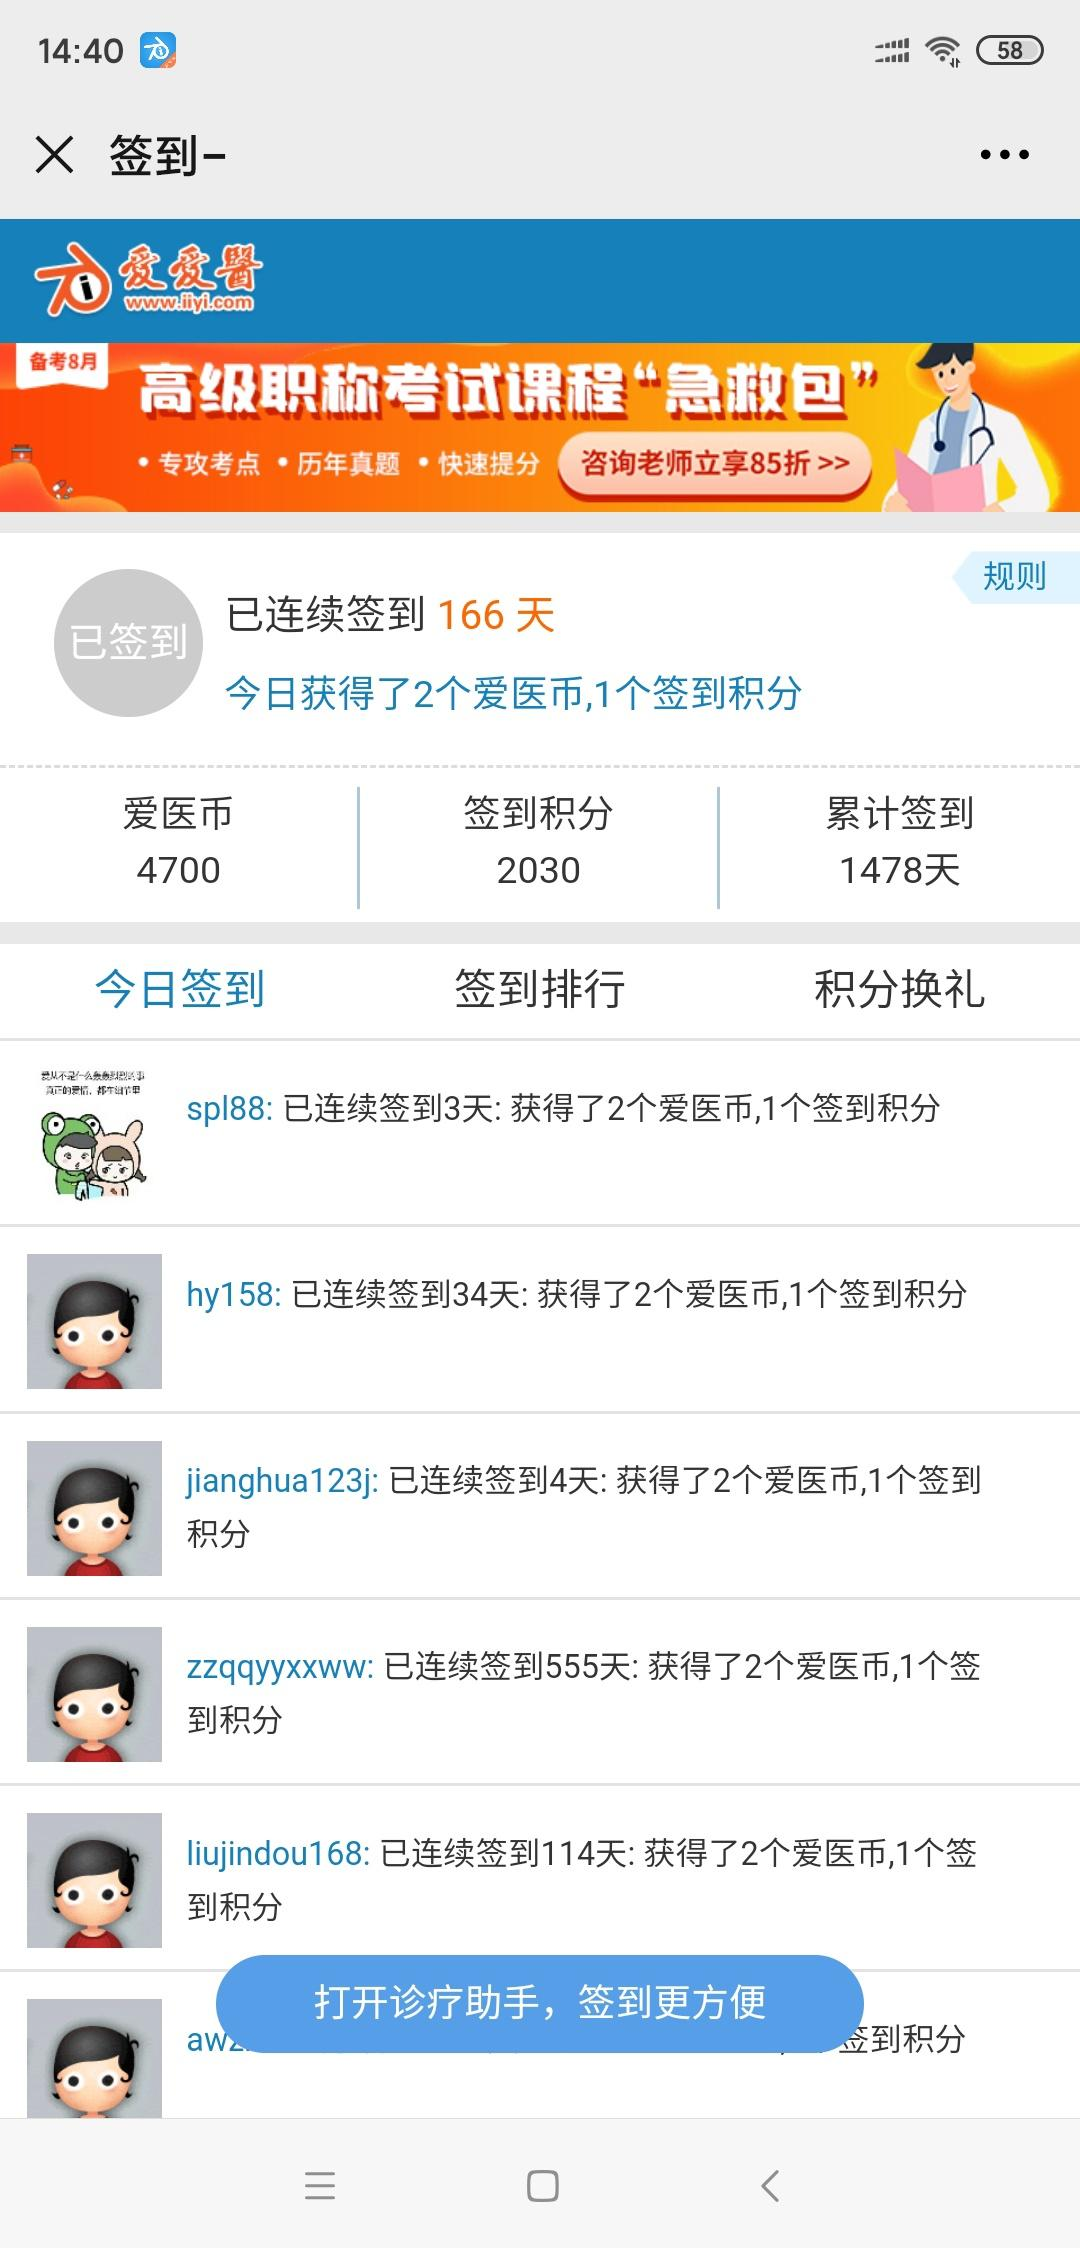 Screenshot_2020-07-09-14-40-40-250_com.tencent.mm.jpg